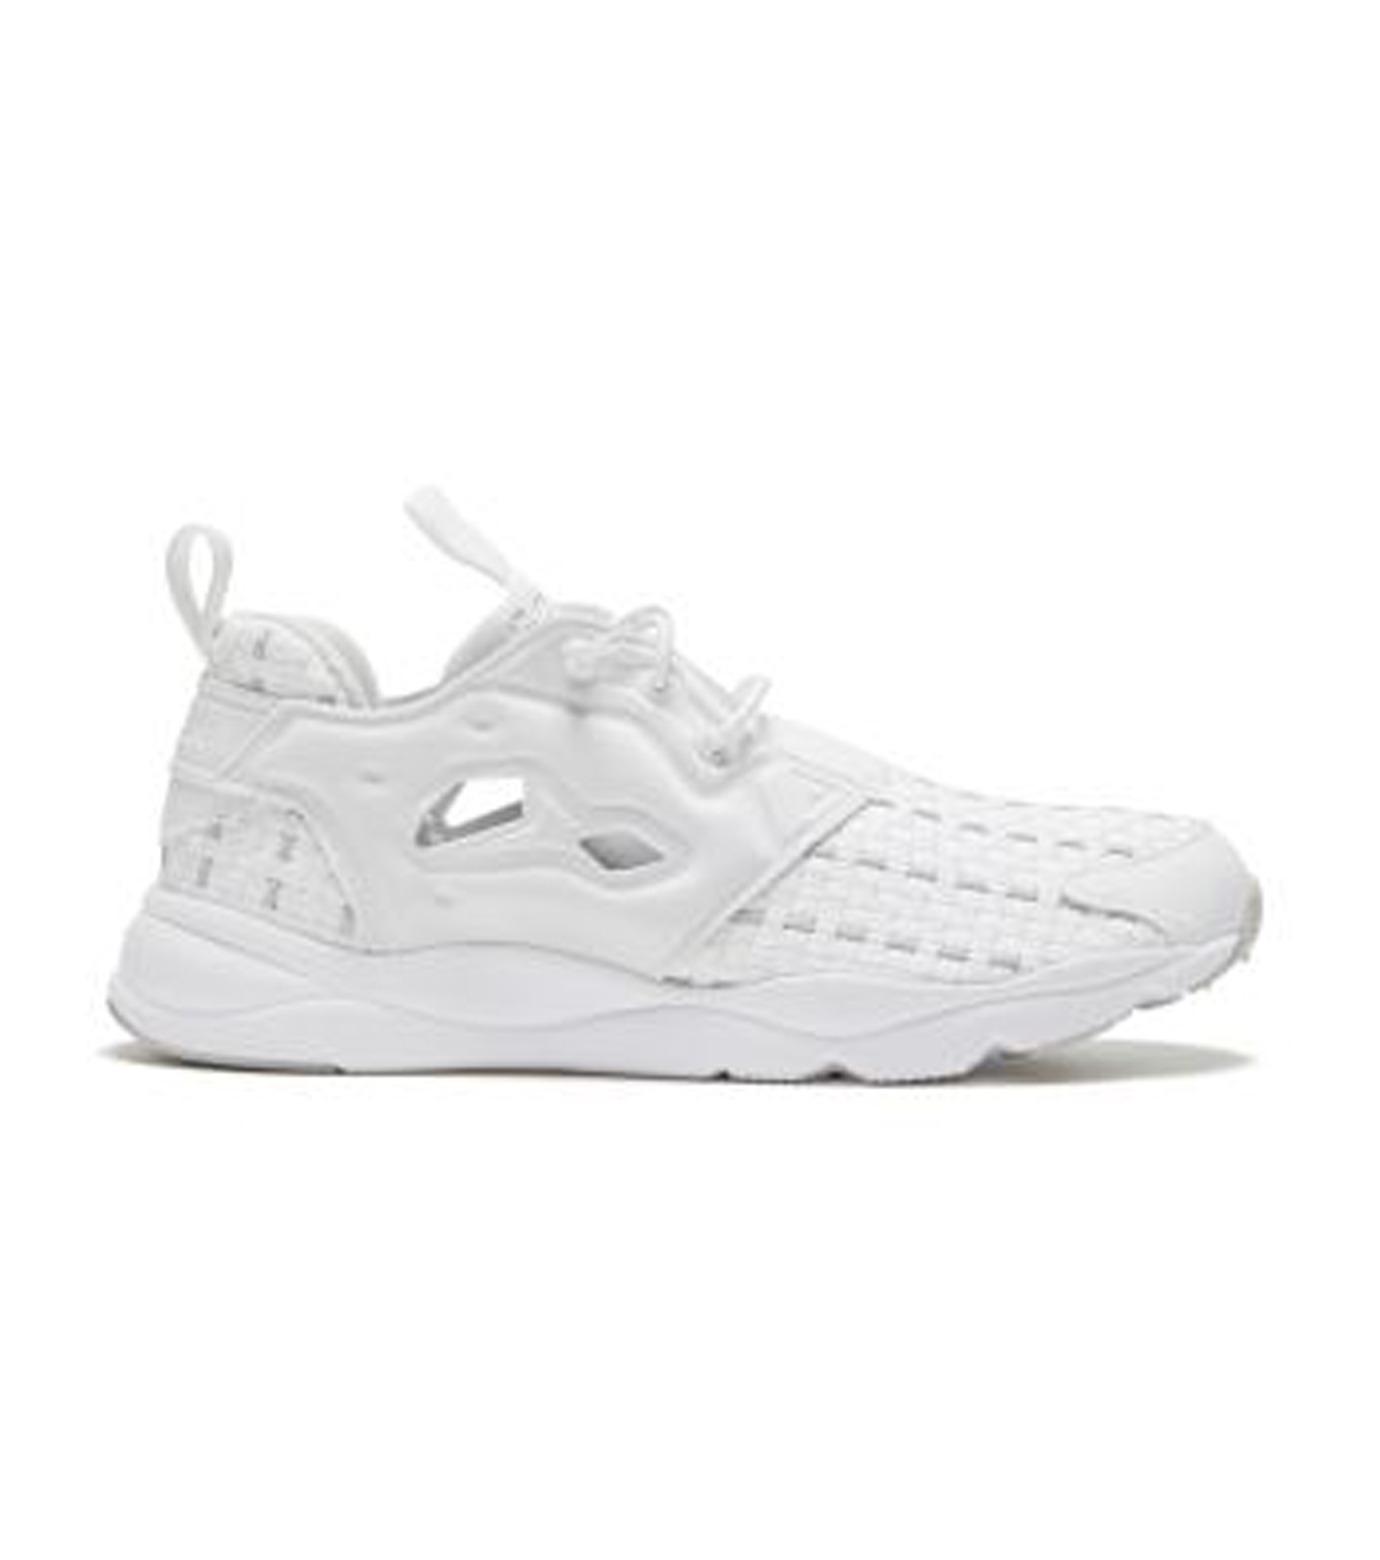 Reebok(リーボック)のFURYLITE NEW WOVEN-WHITE(シューズ/shoes)-V70797-4 拡大詳細画像1